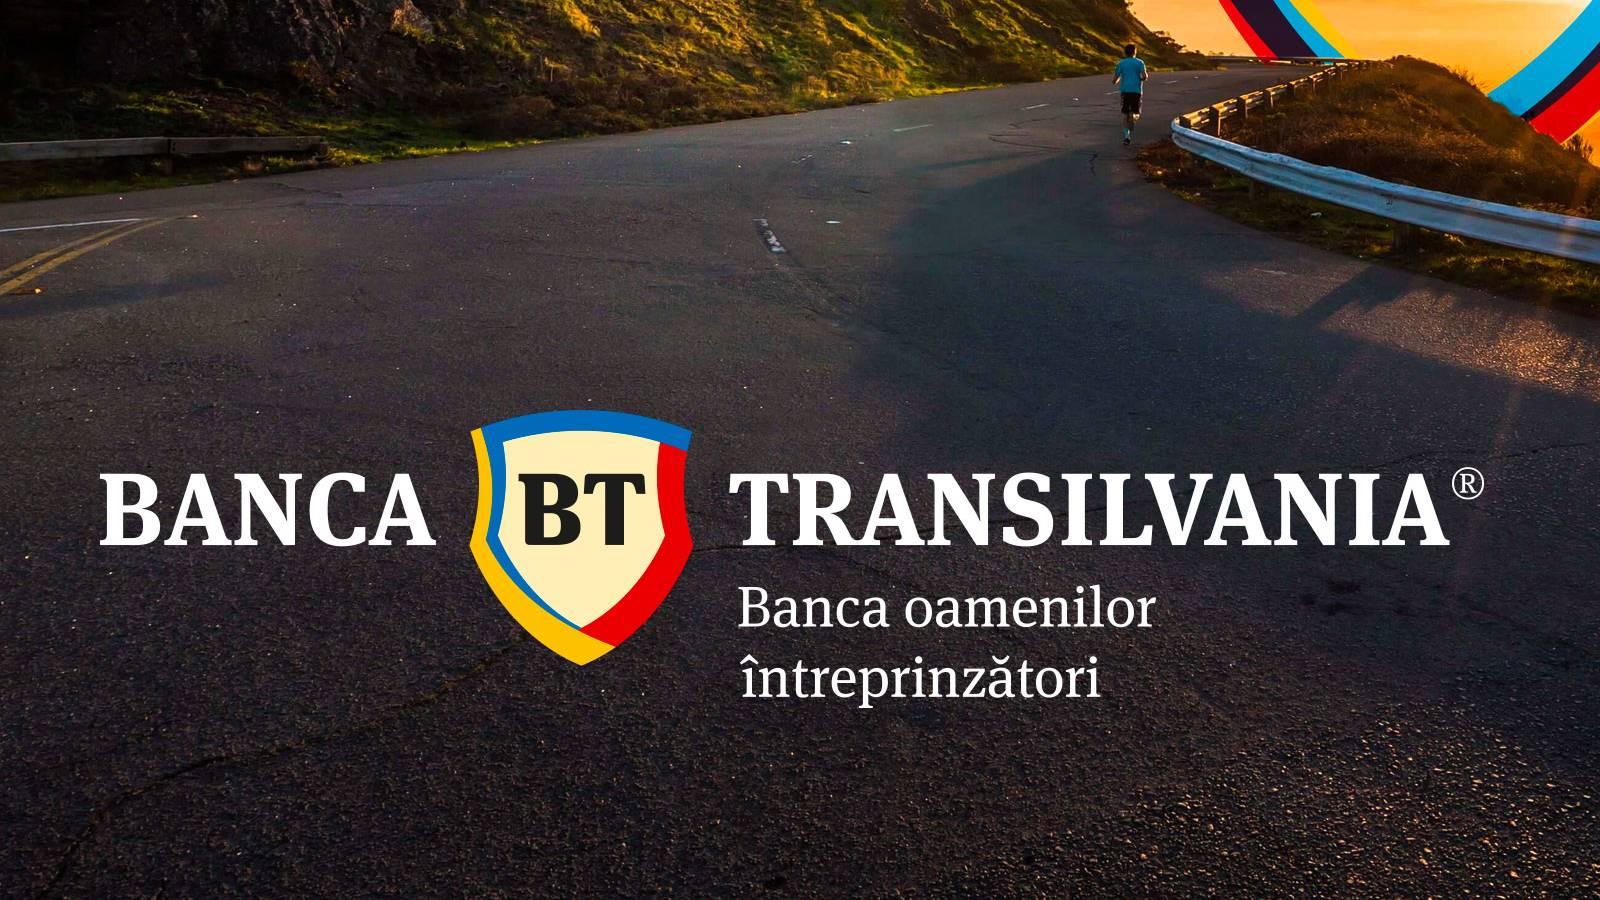 BANCA Transilvania hamace